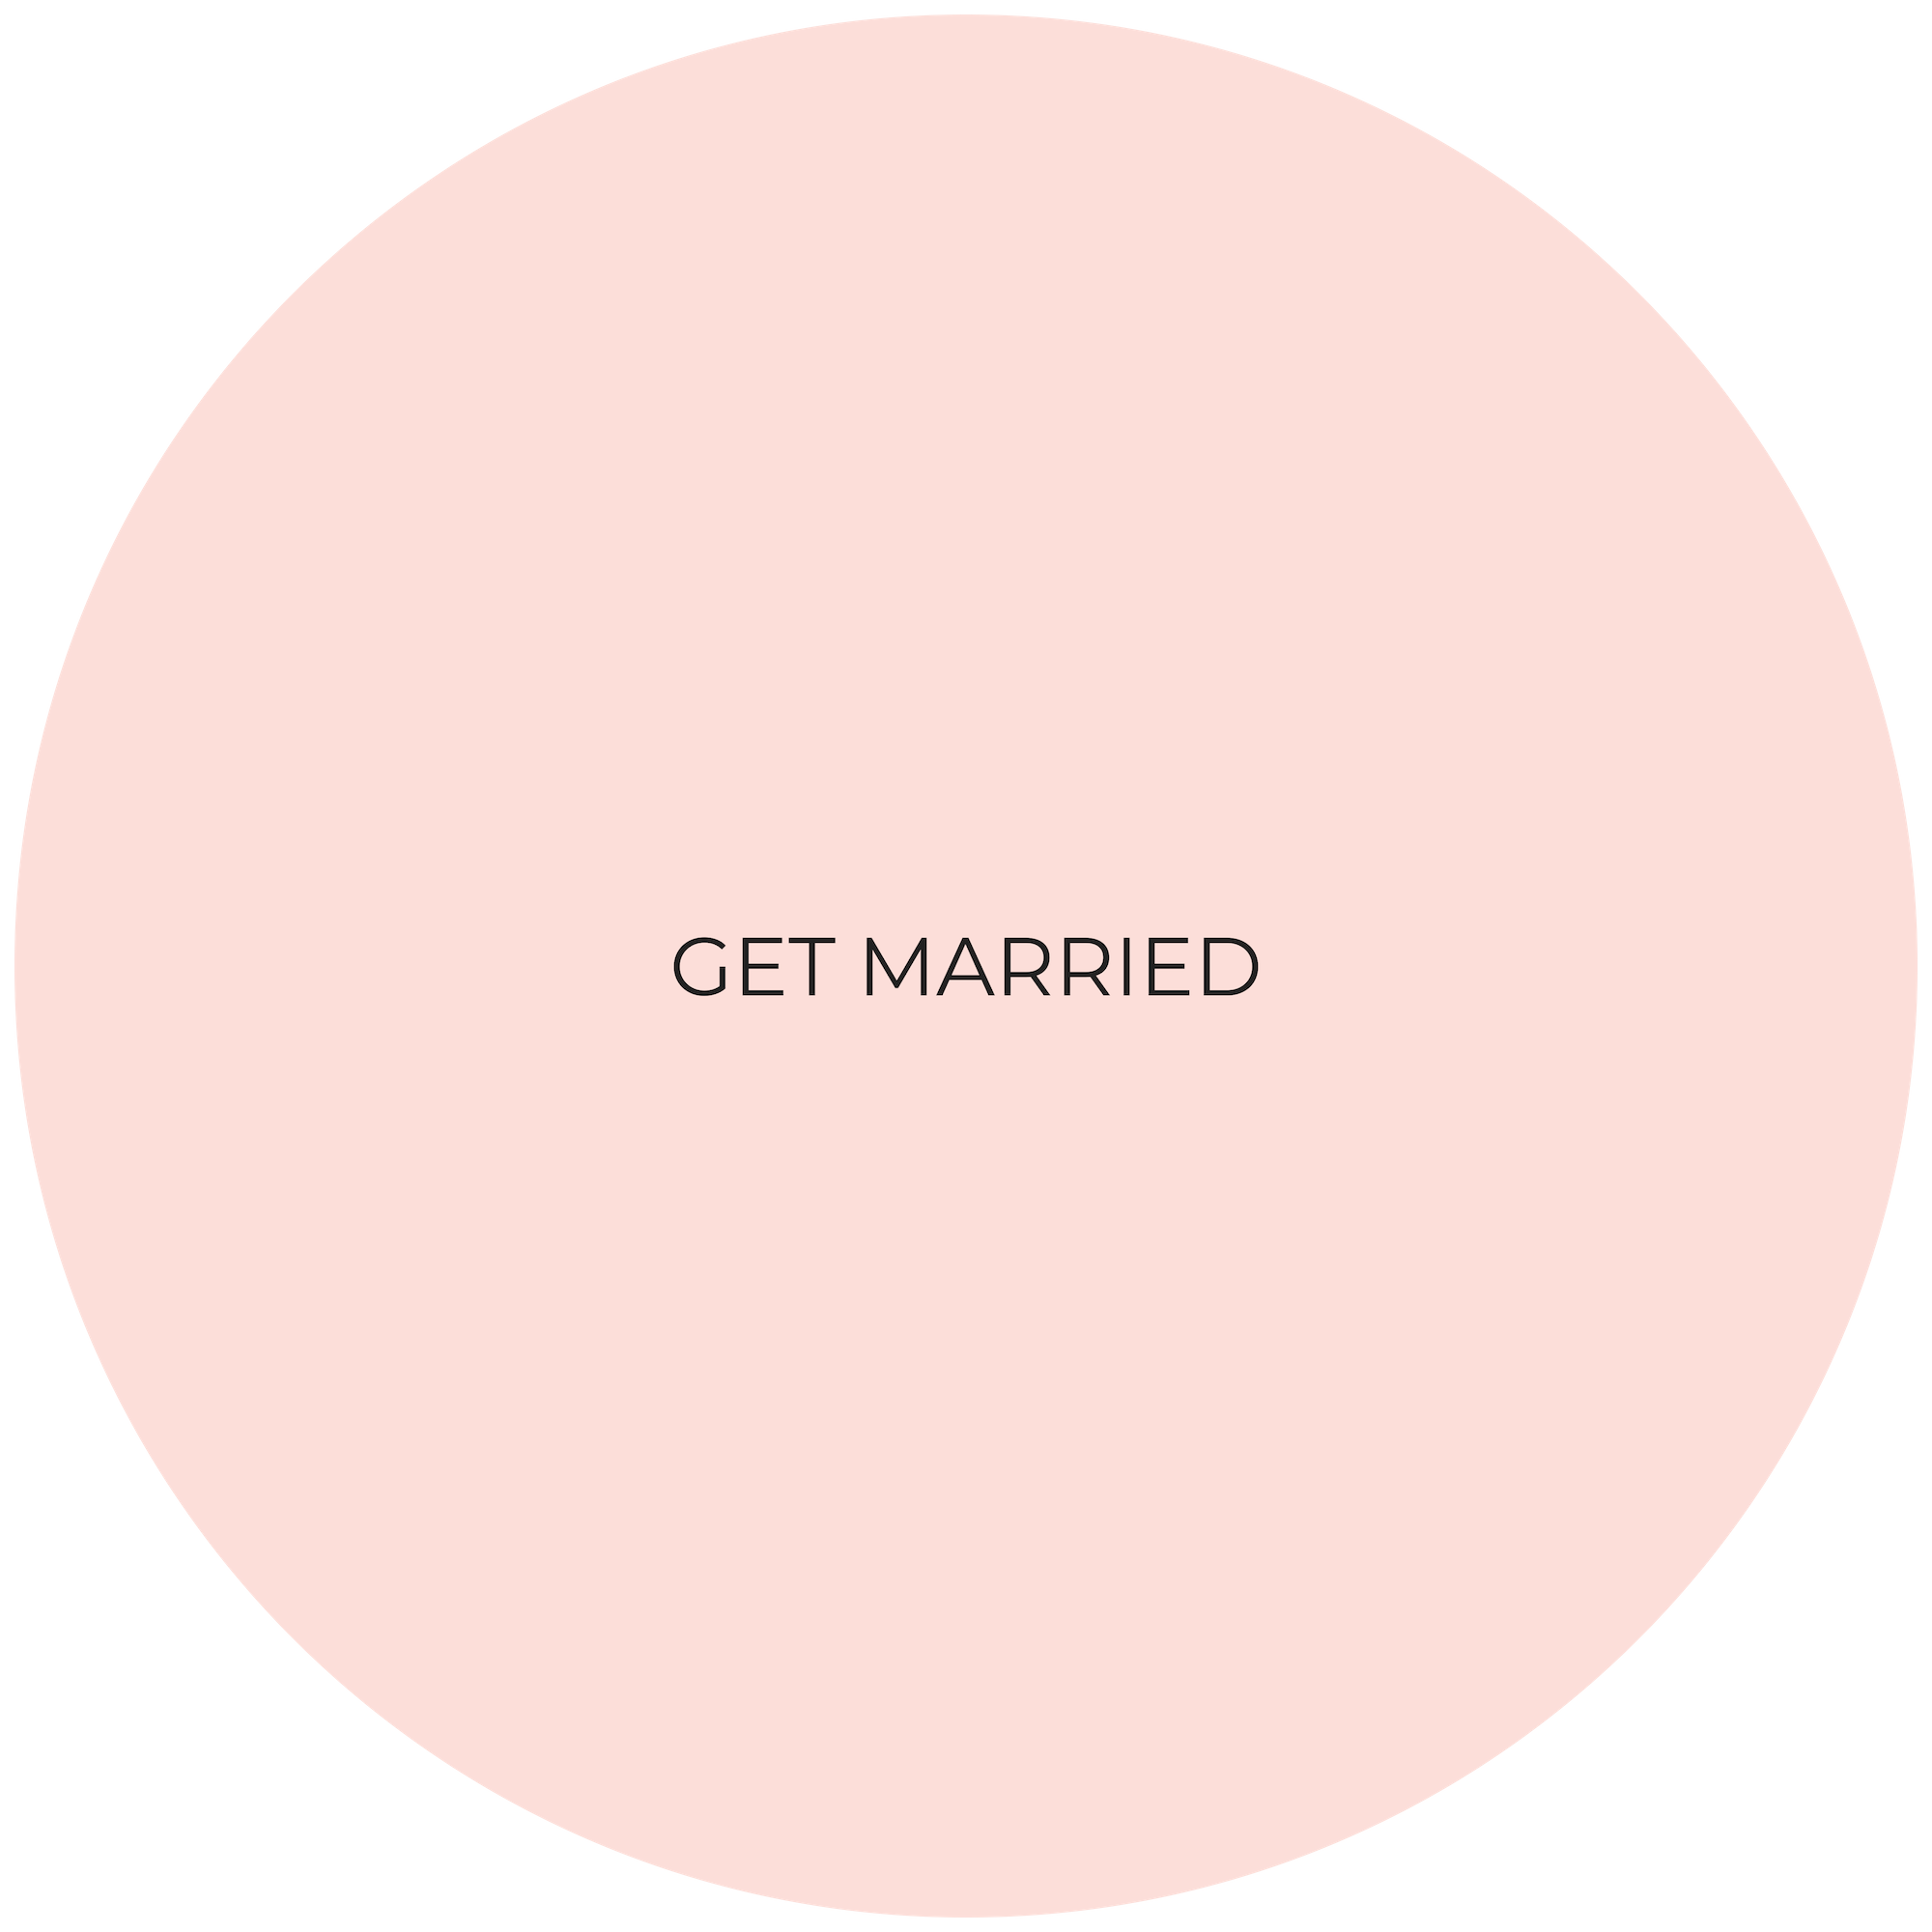 lt pink circle image (1).png